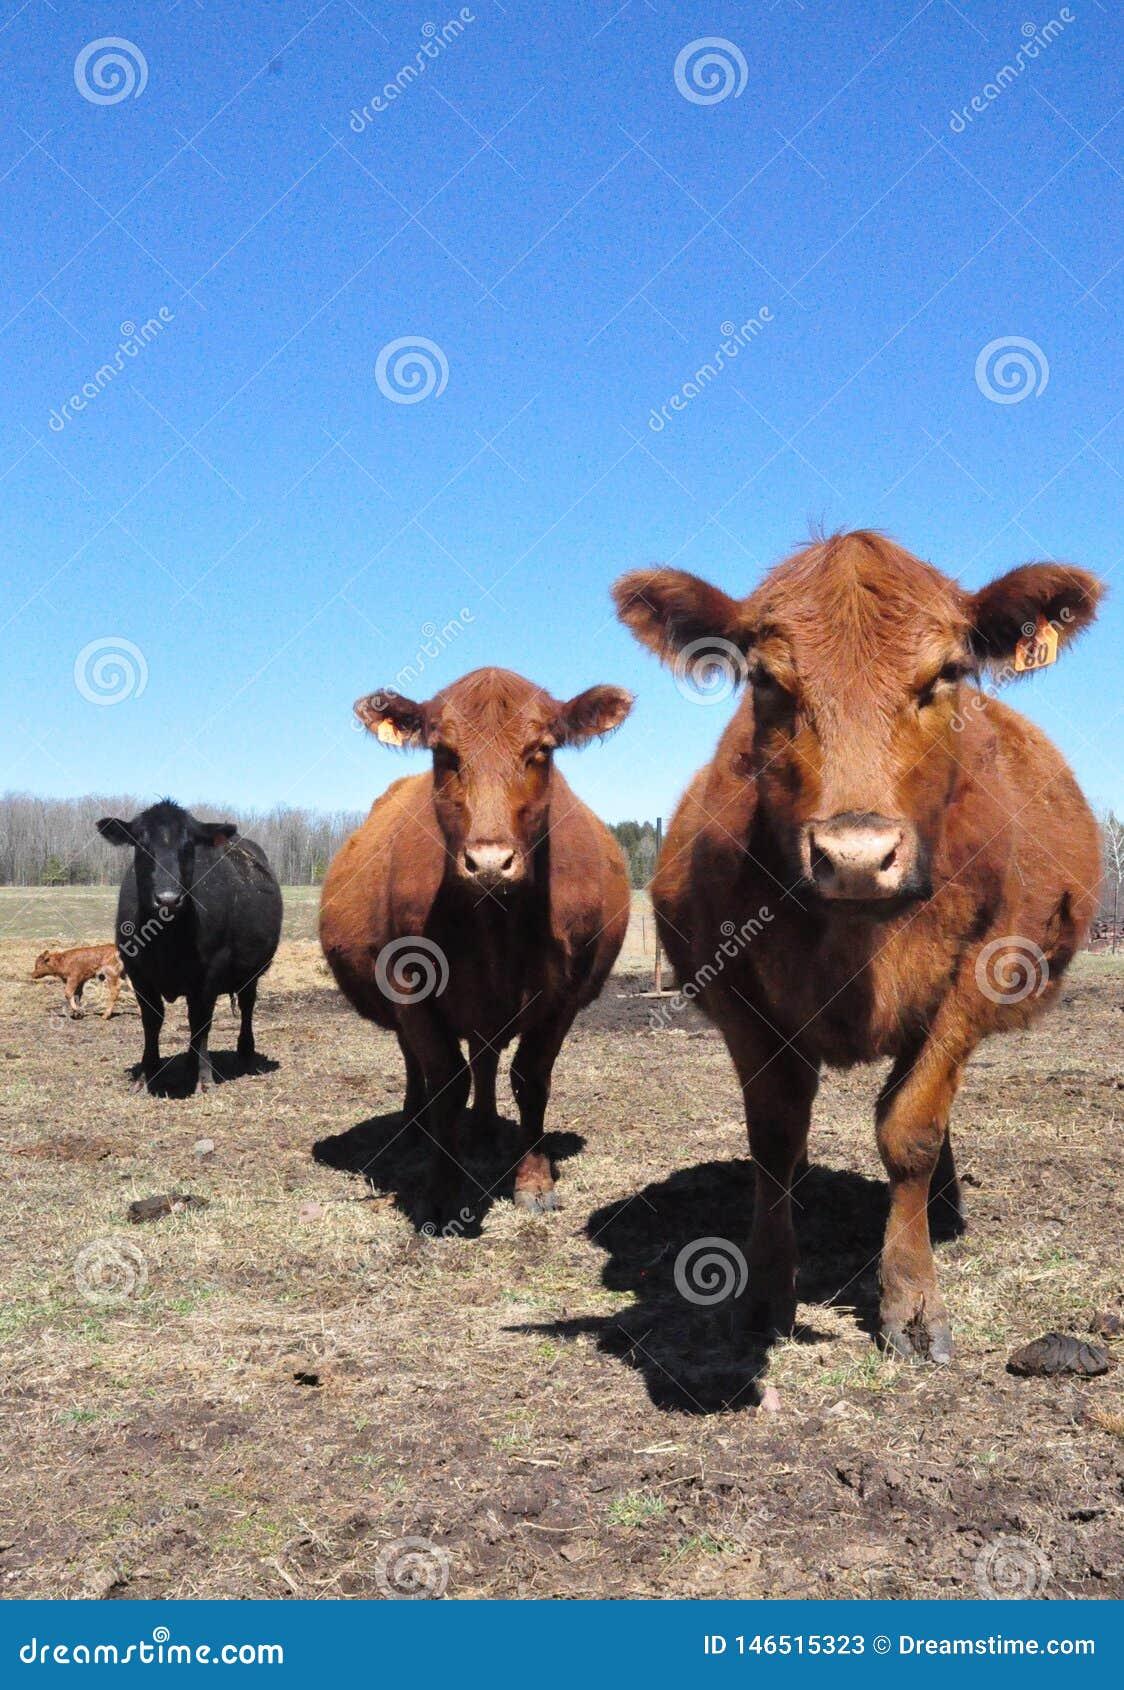 Schultz Cows Photo